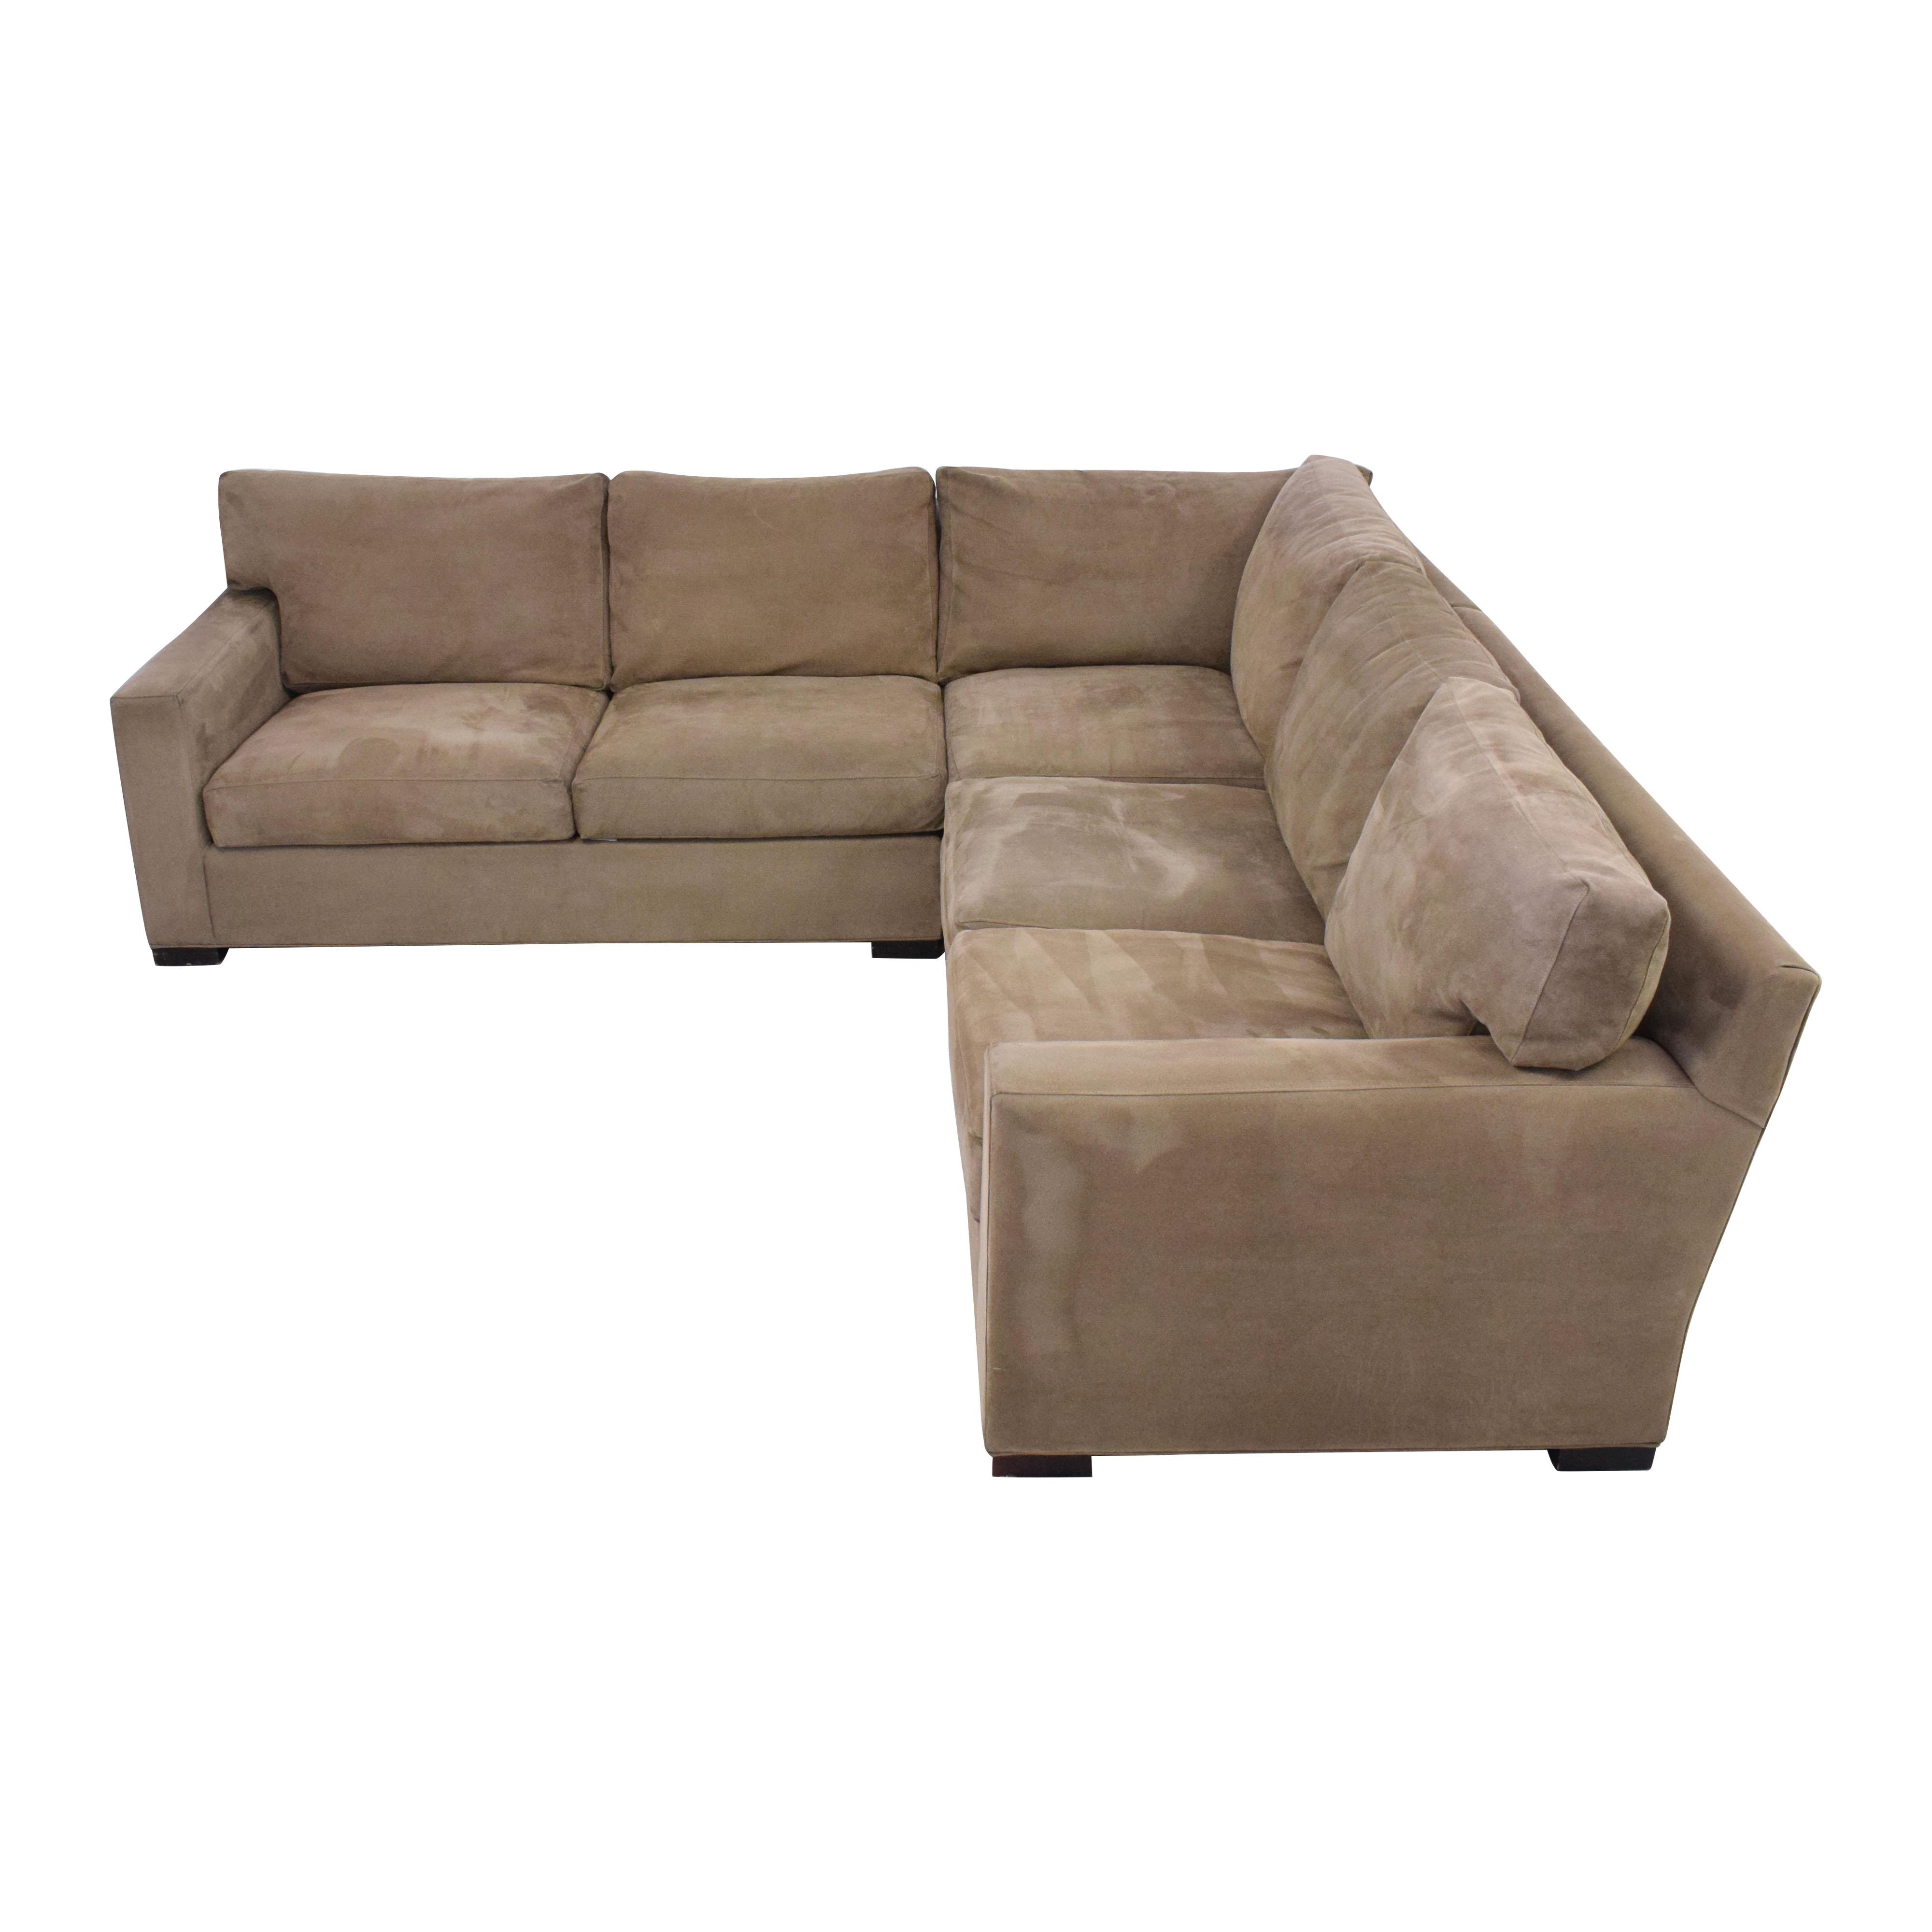 Crate & Barrel Crate & Barrel Axis II 3-Piece Sectional Sofa coupon